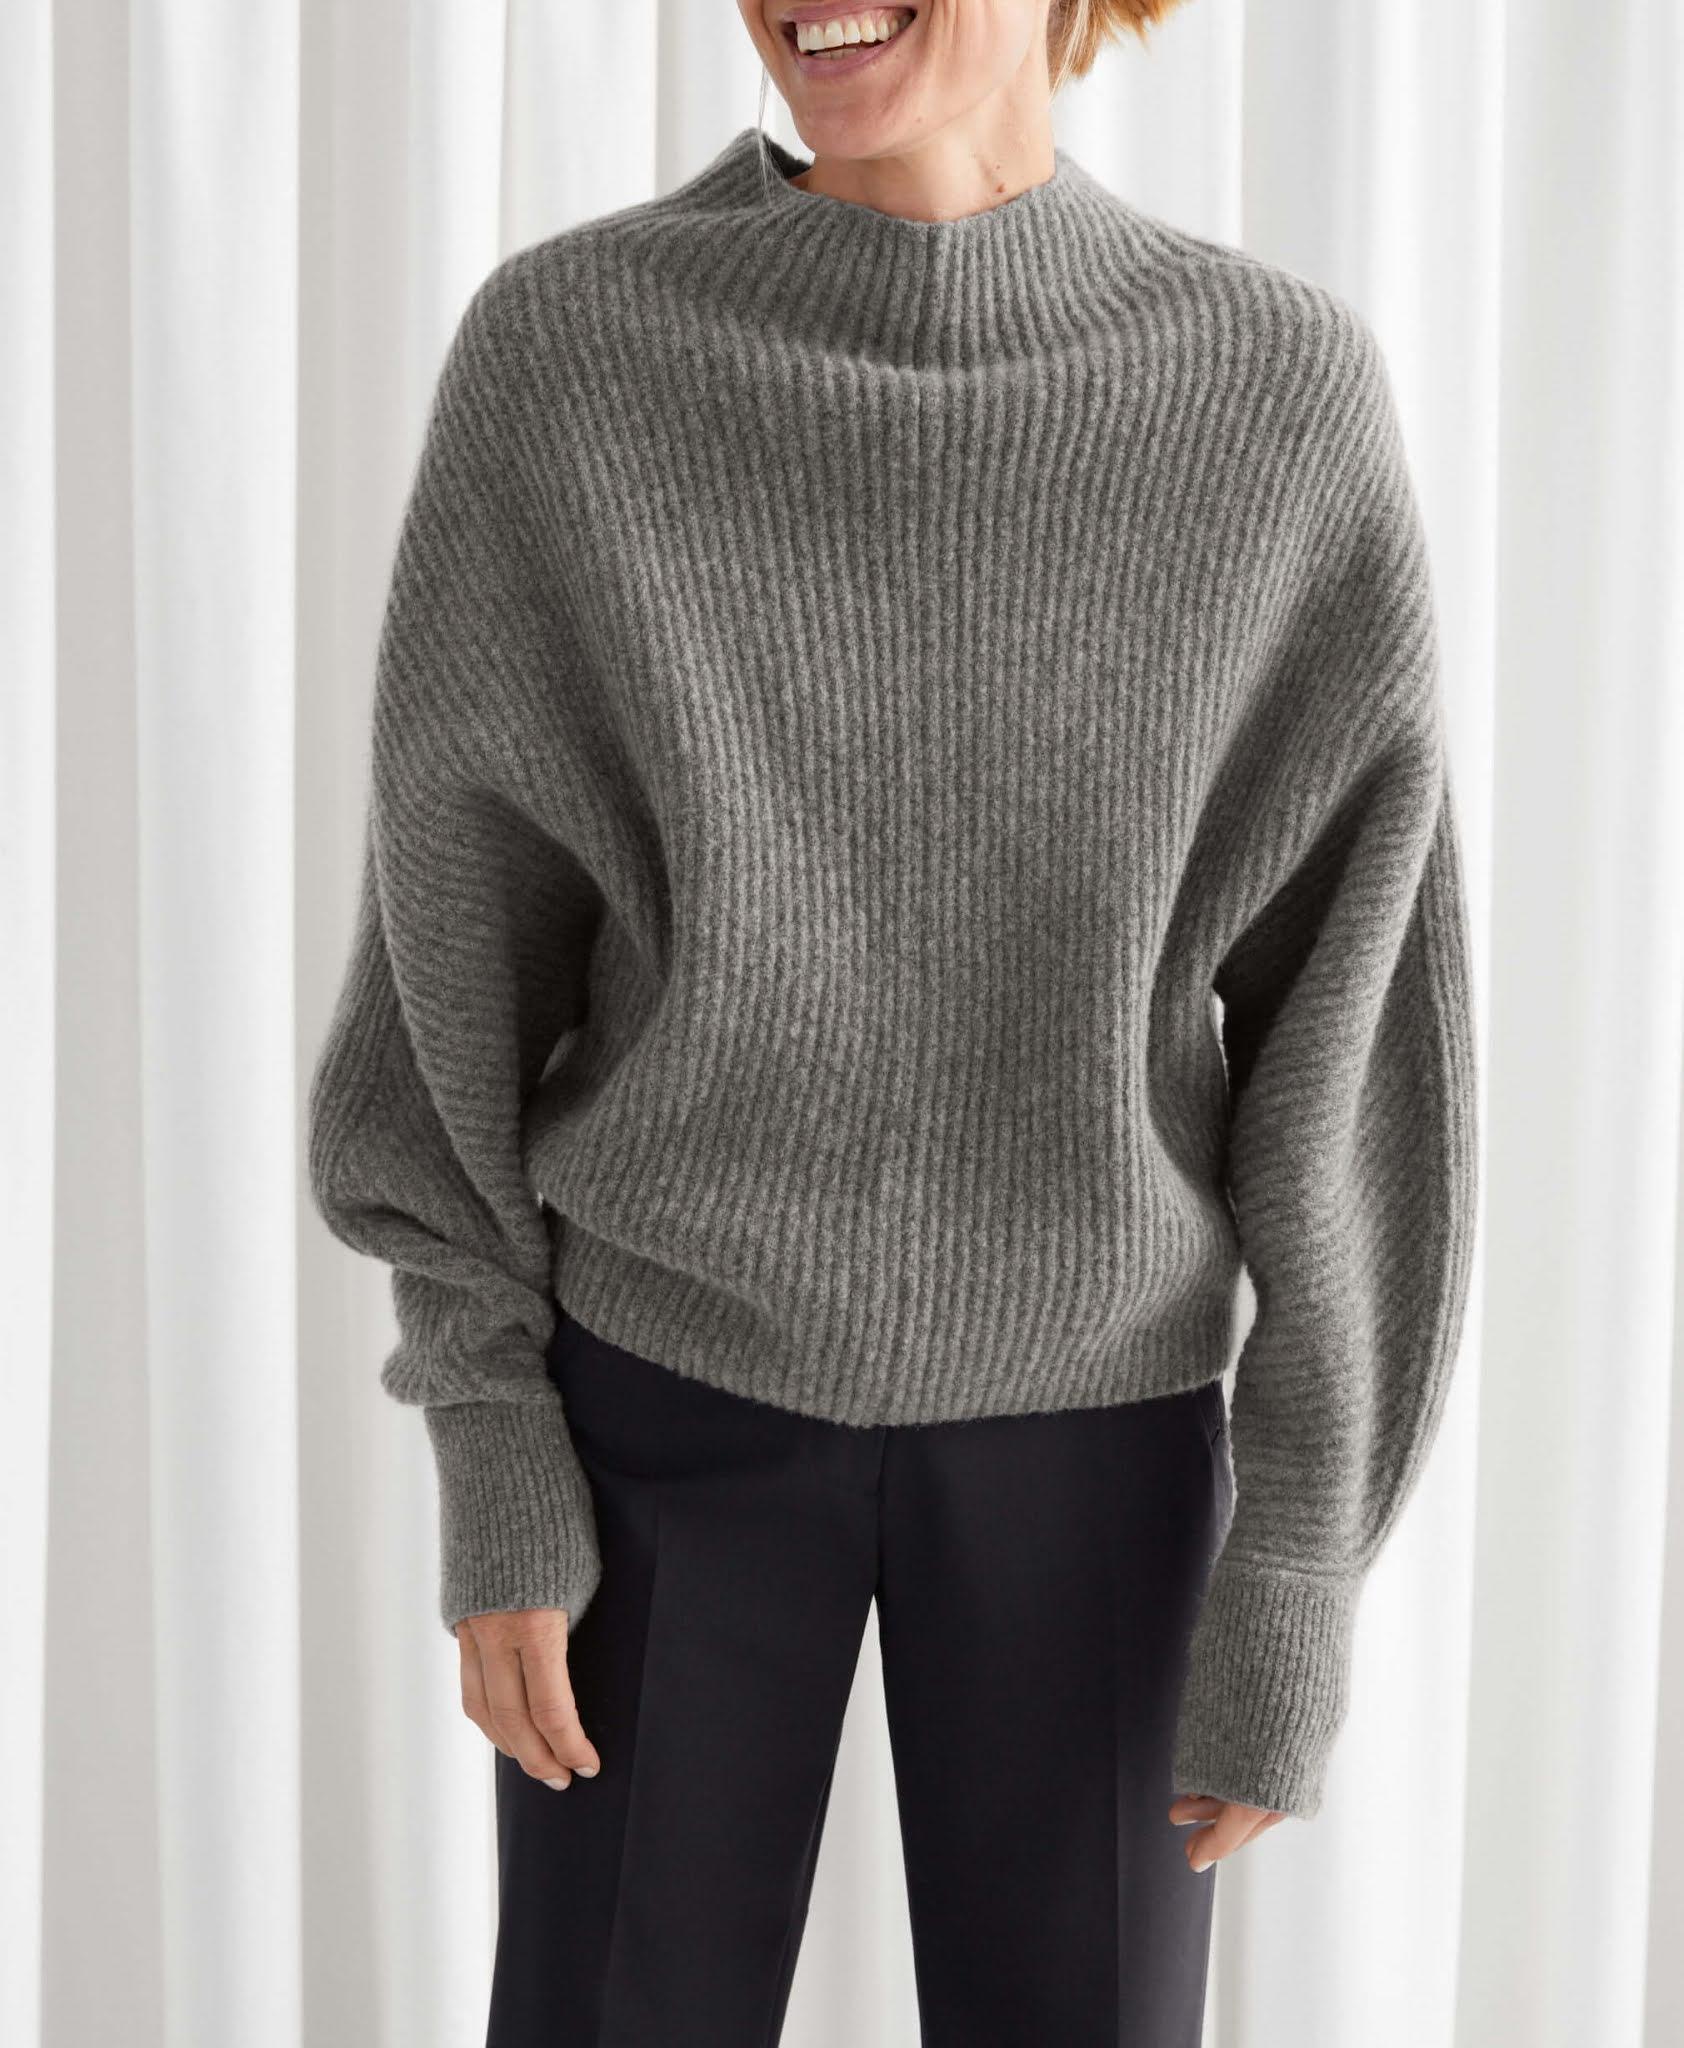 voluminous turtleneck knit jumper